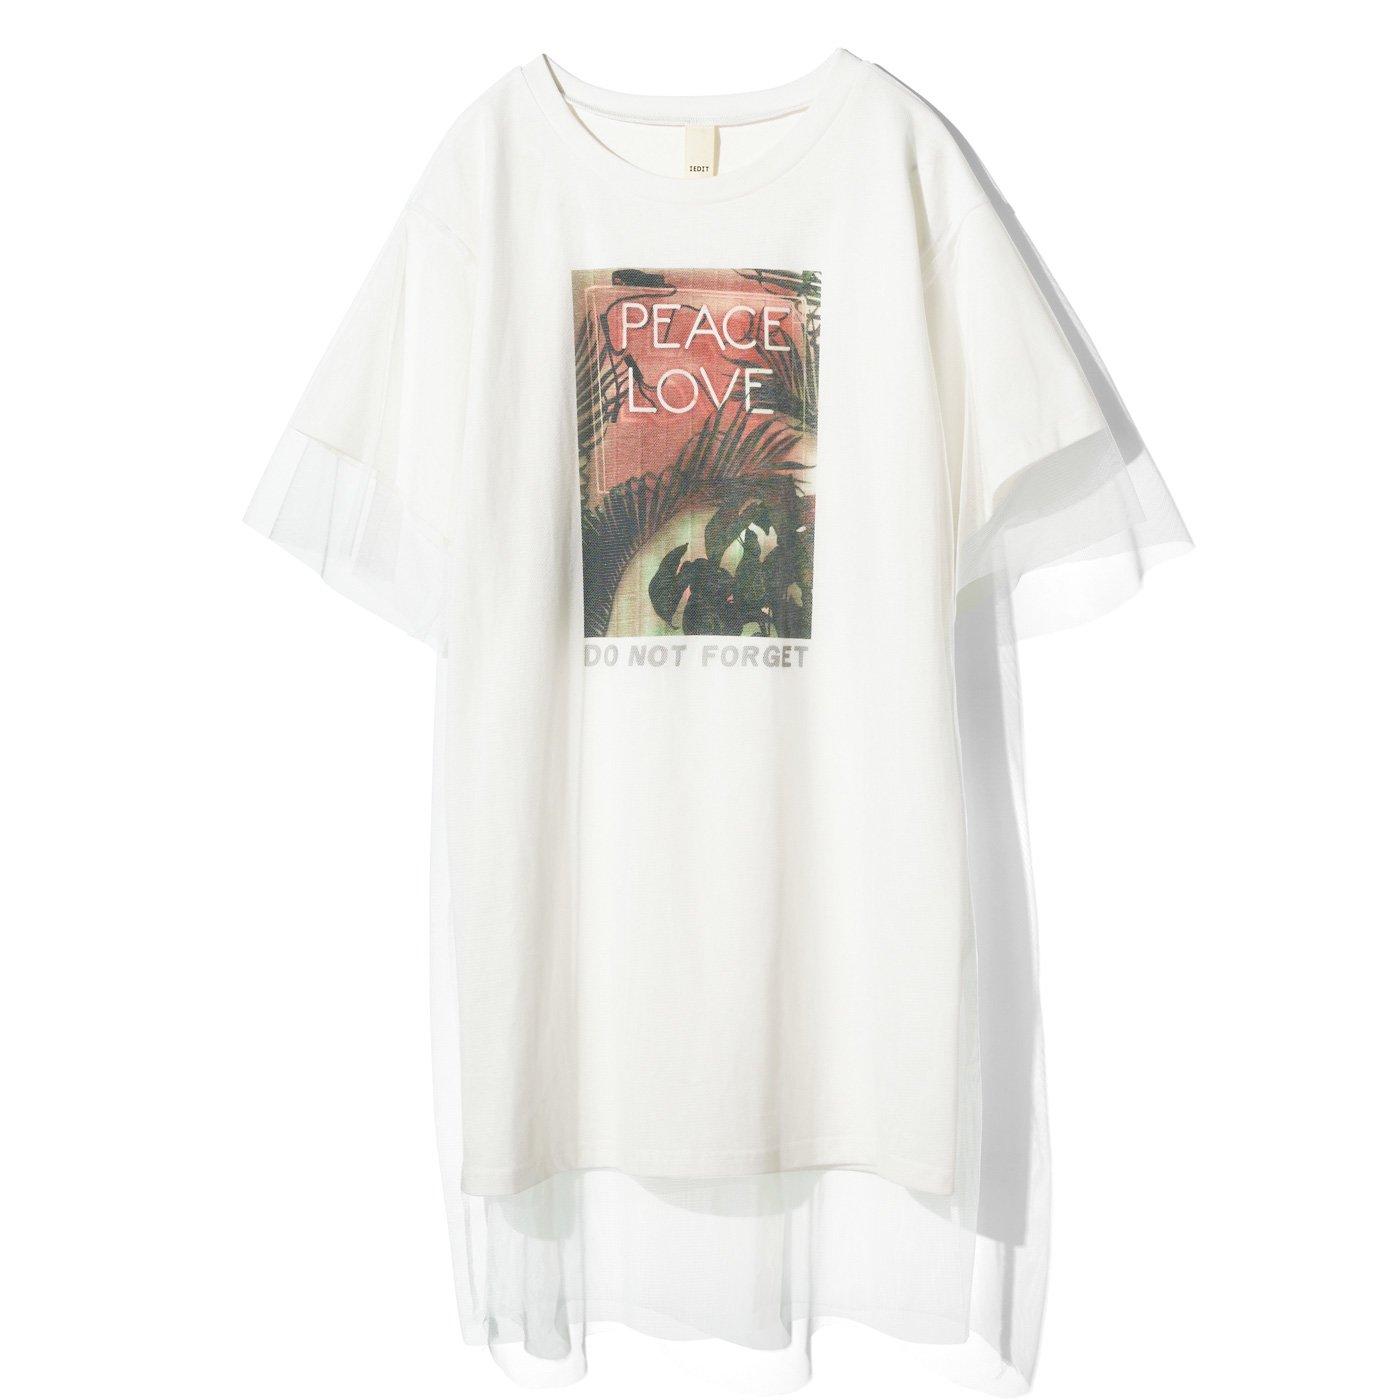 IEDIT[イディット] グラフィックプリントのレイヤードビッグTシャツ〈ホワイト〉